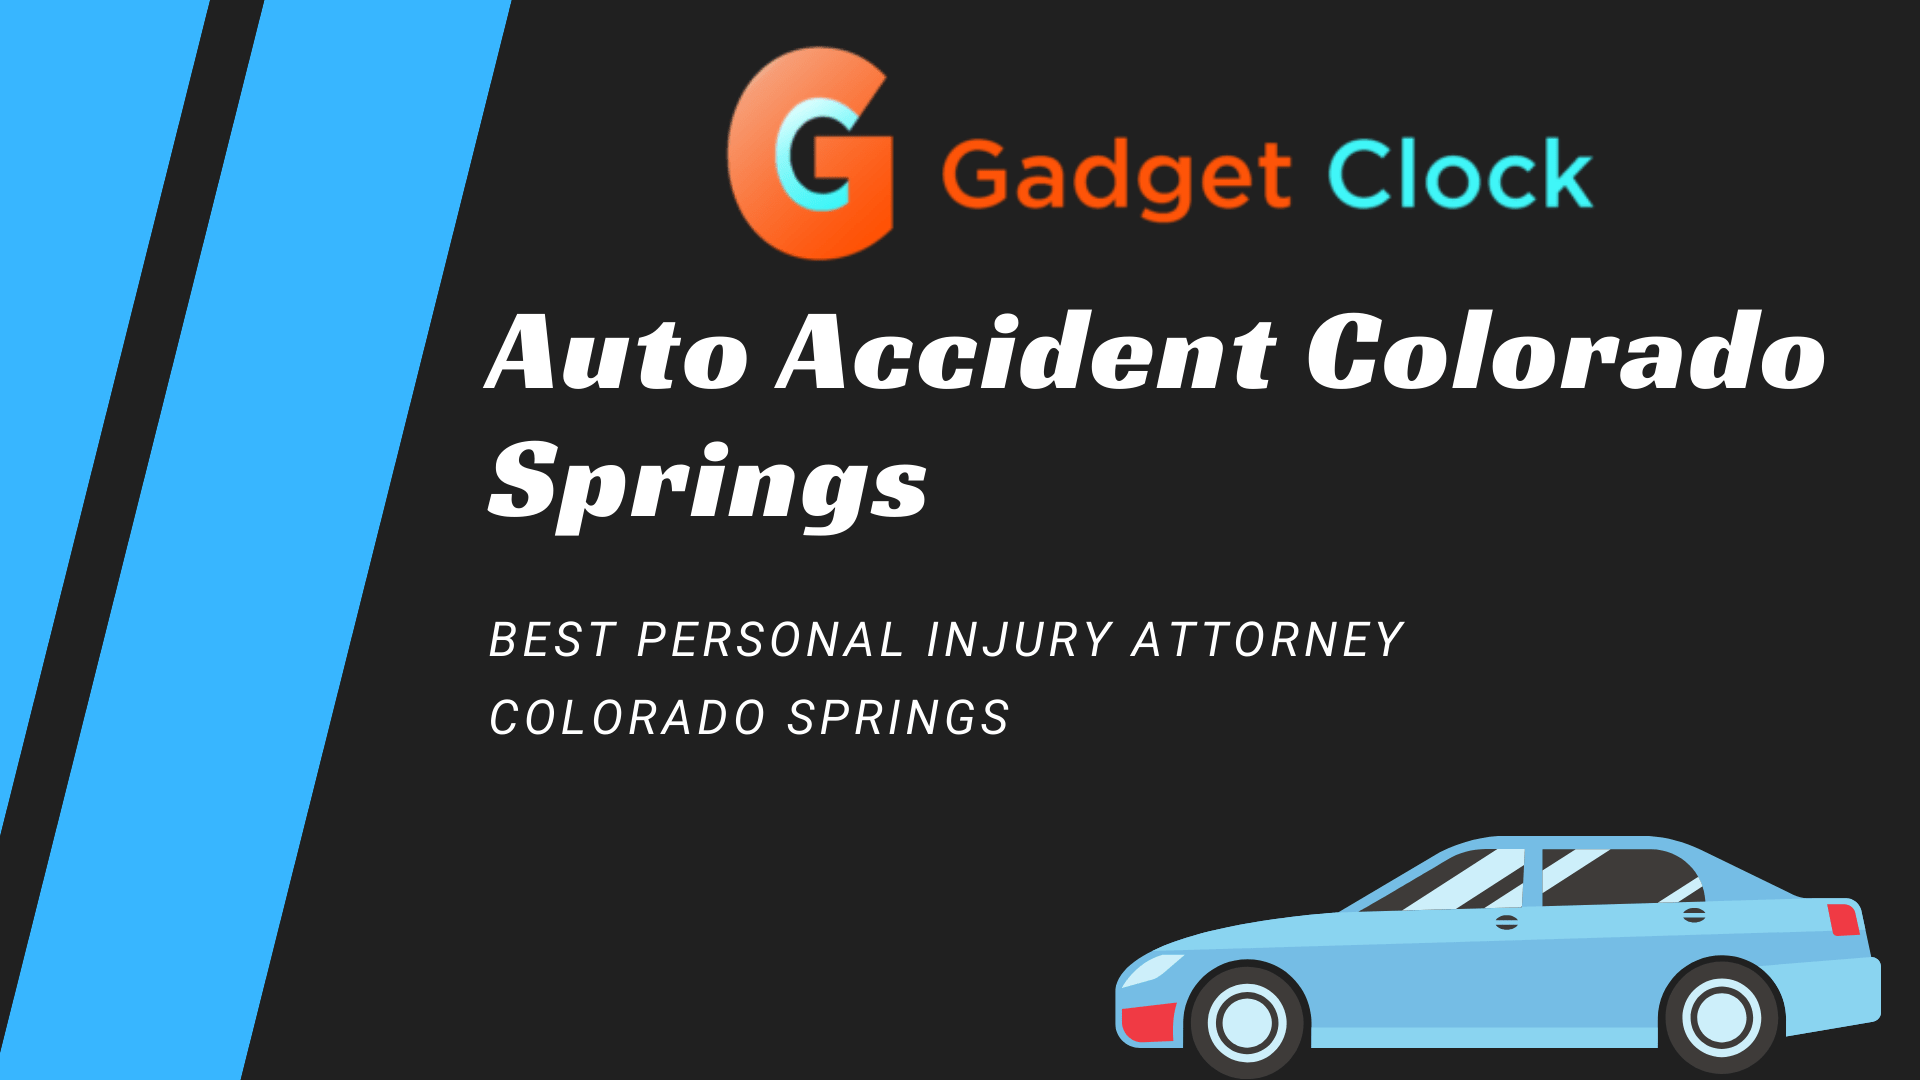 Auto accident attorney Colorado Springs: best personal injury attorney colorado springs 2021